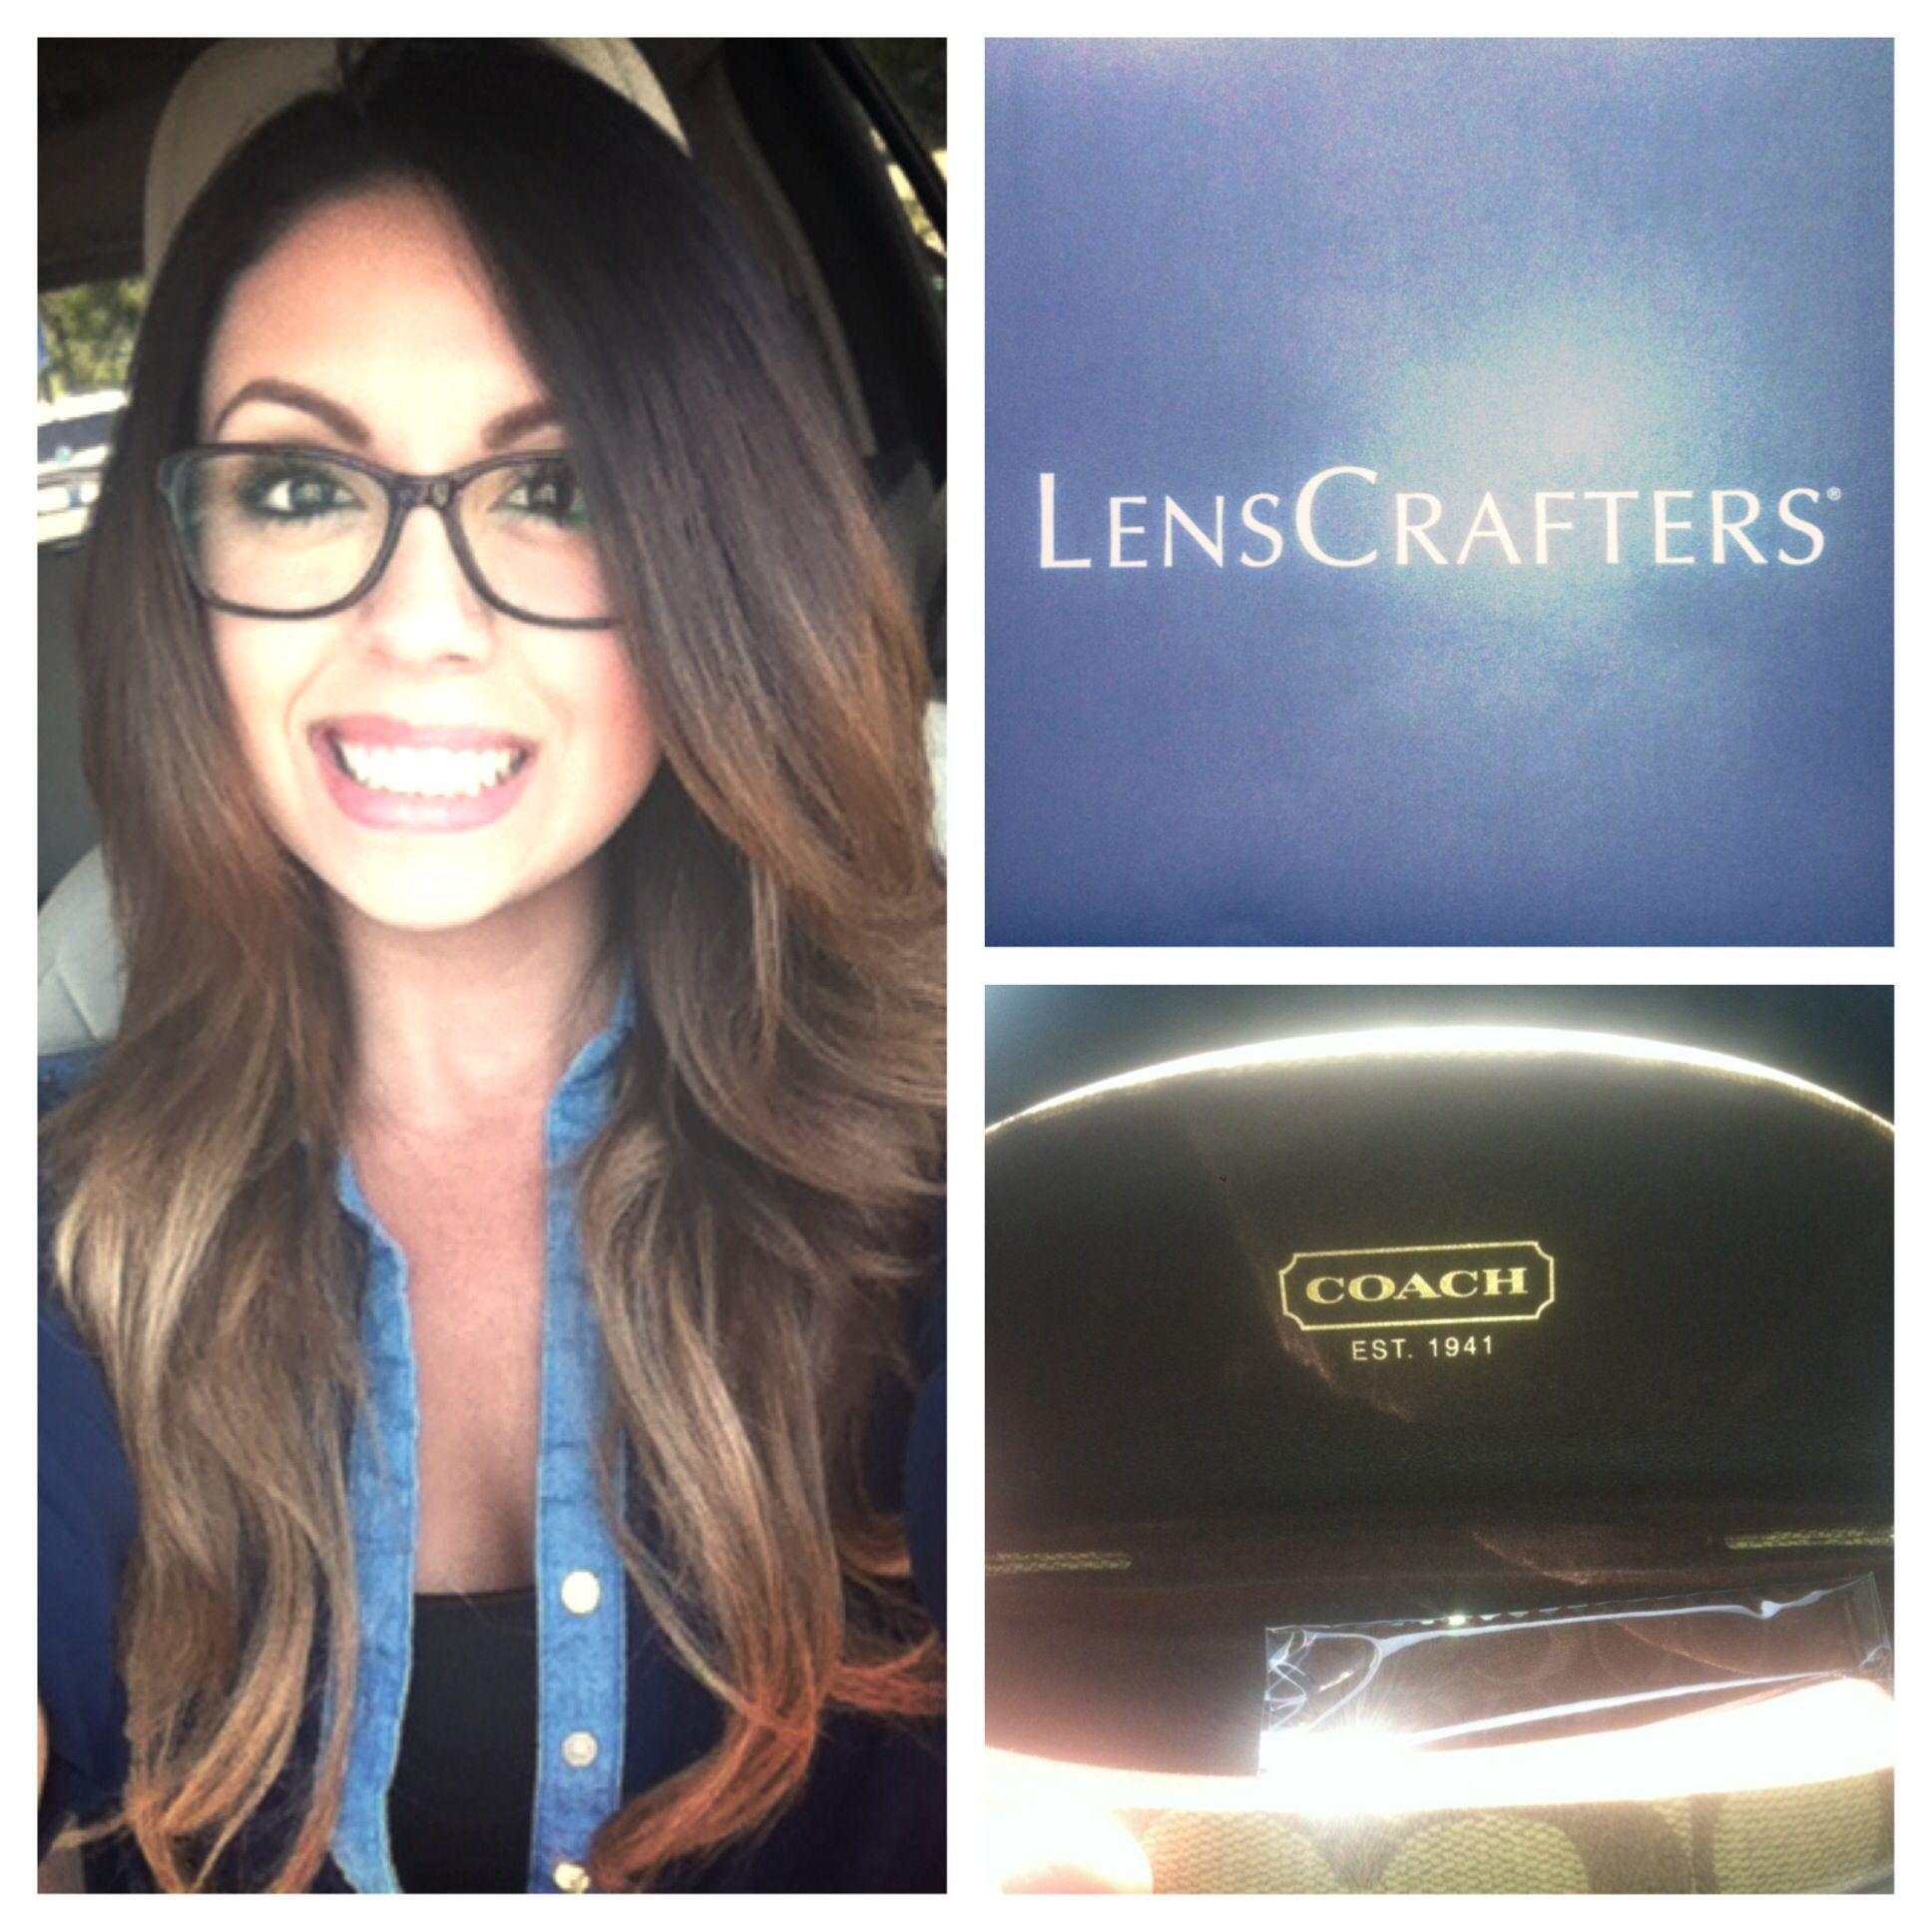 lenscrafters coach frames